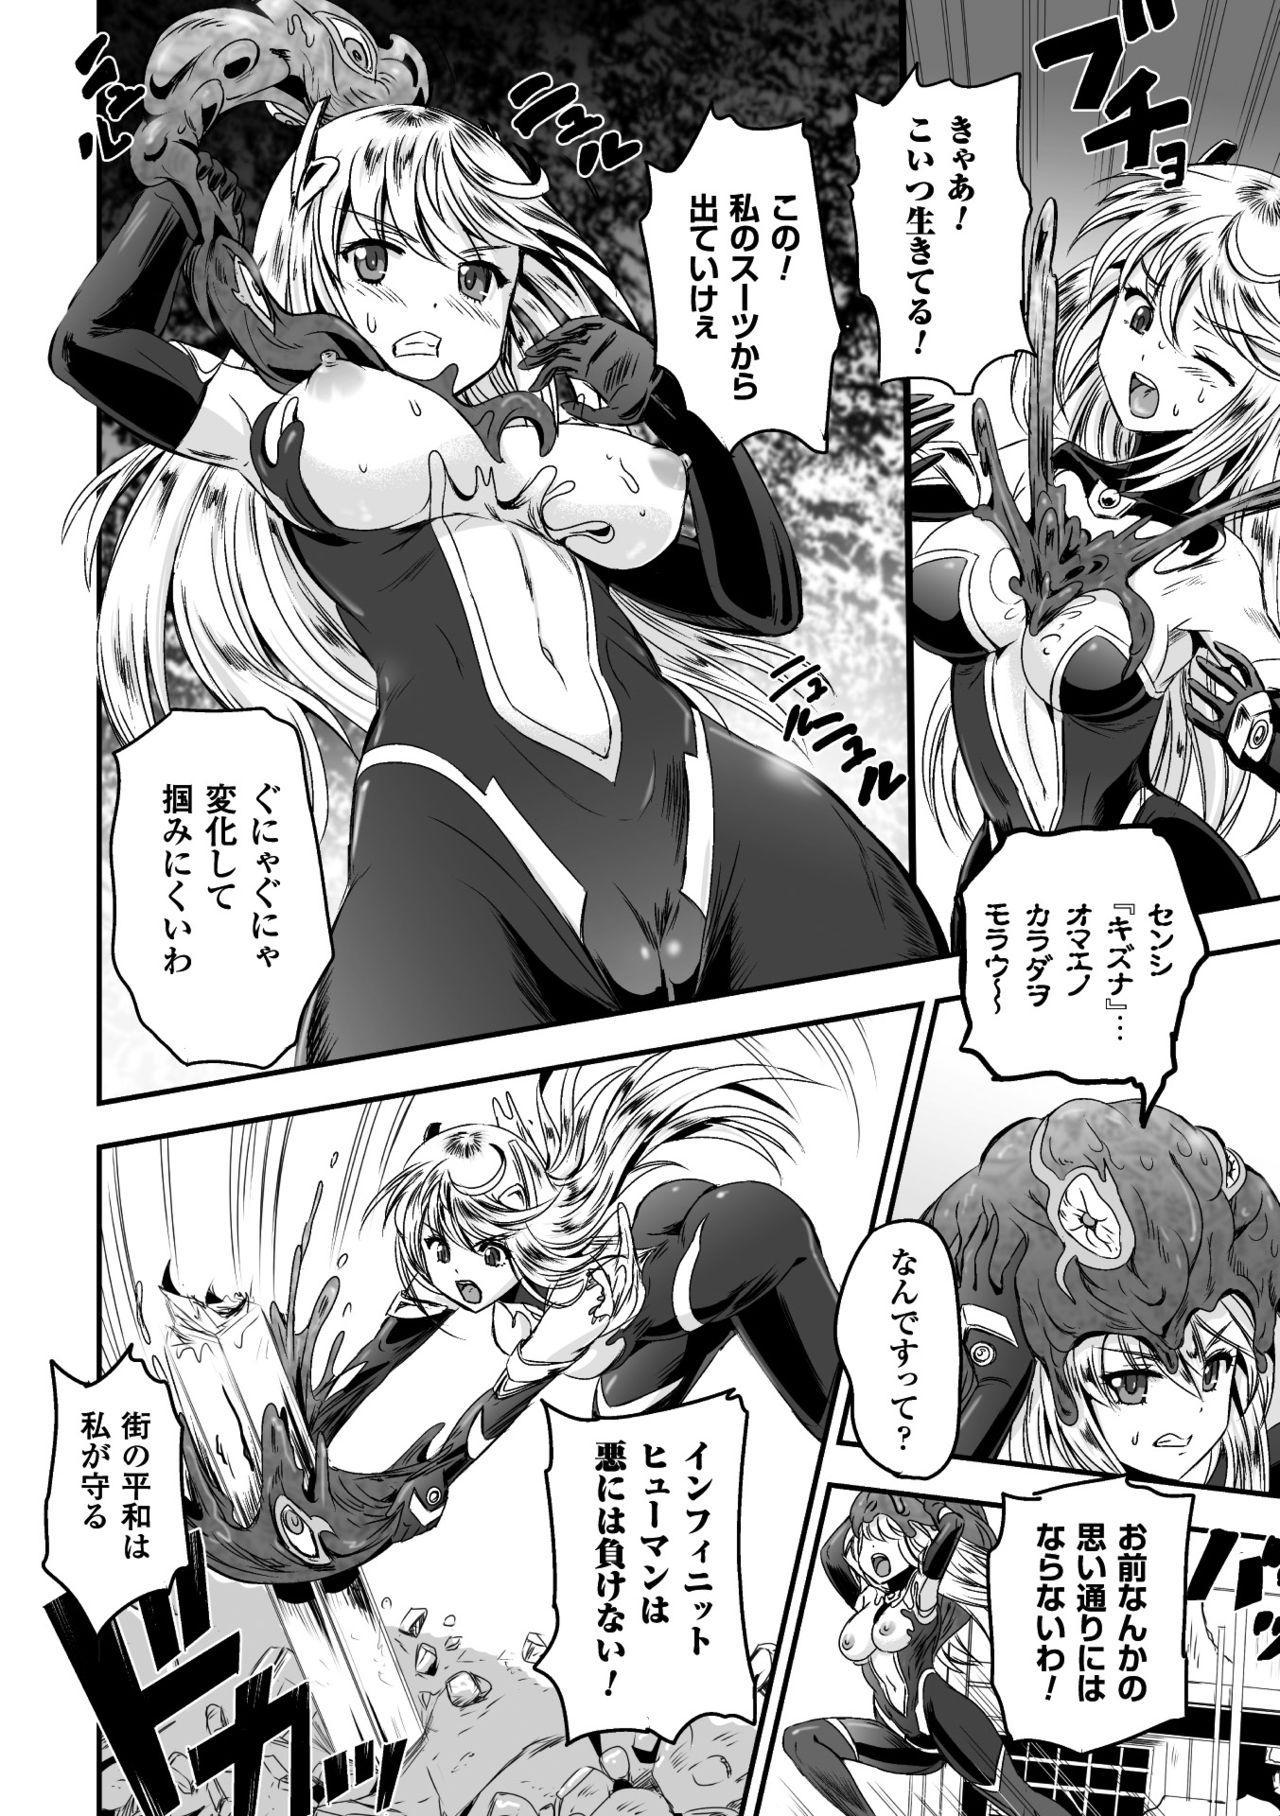 2D Comic Magazine Shokushu Yoroi ni Zenshin o Okasare Mugen Zecchou! Vol. 5 25